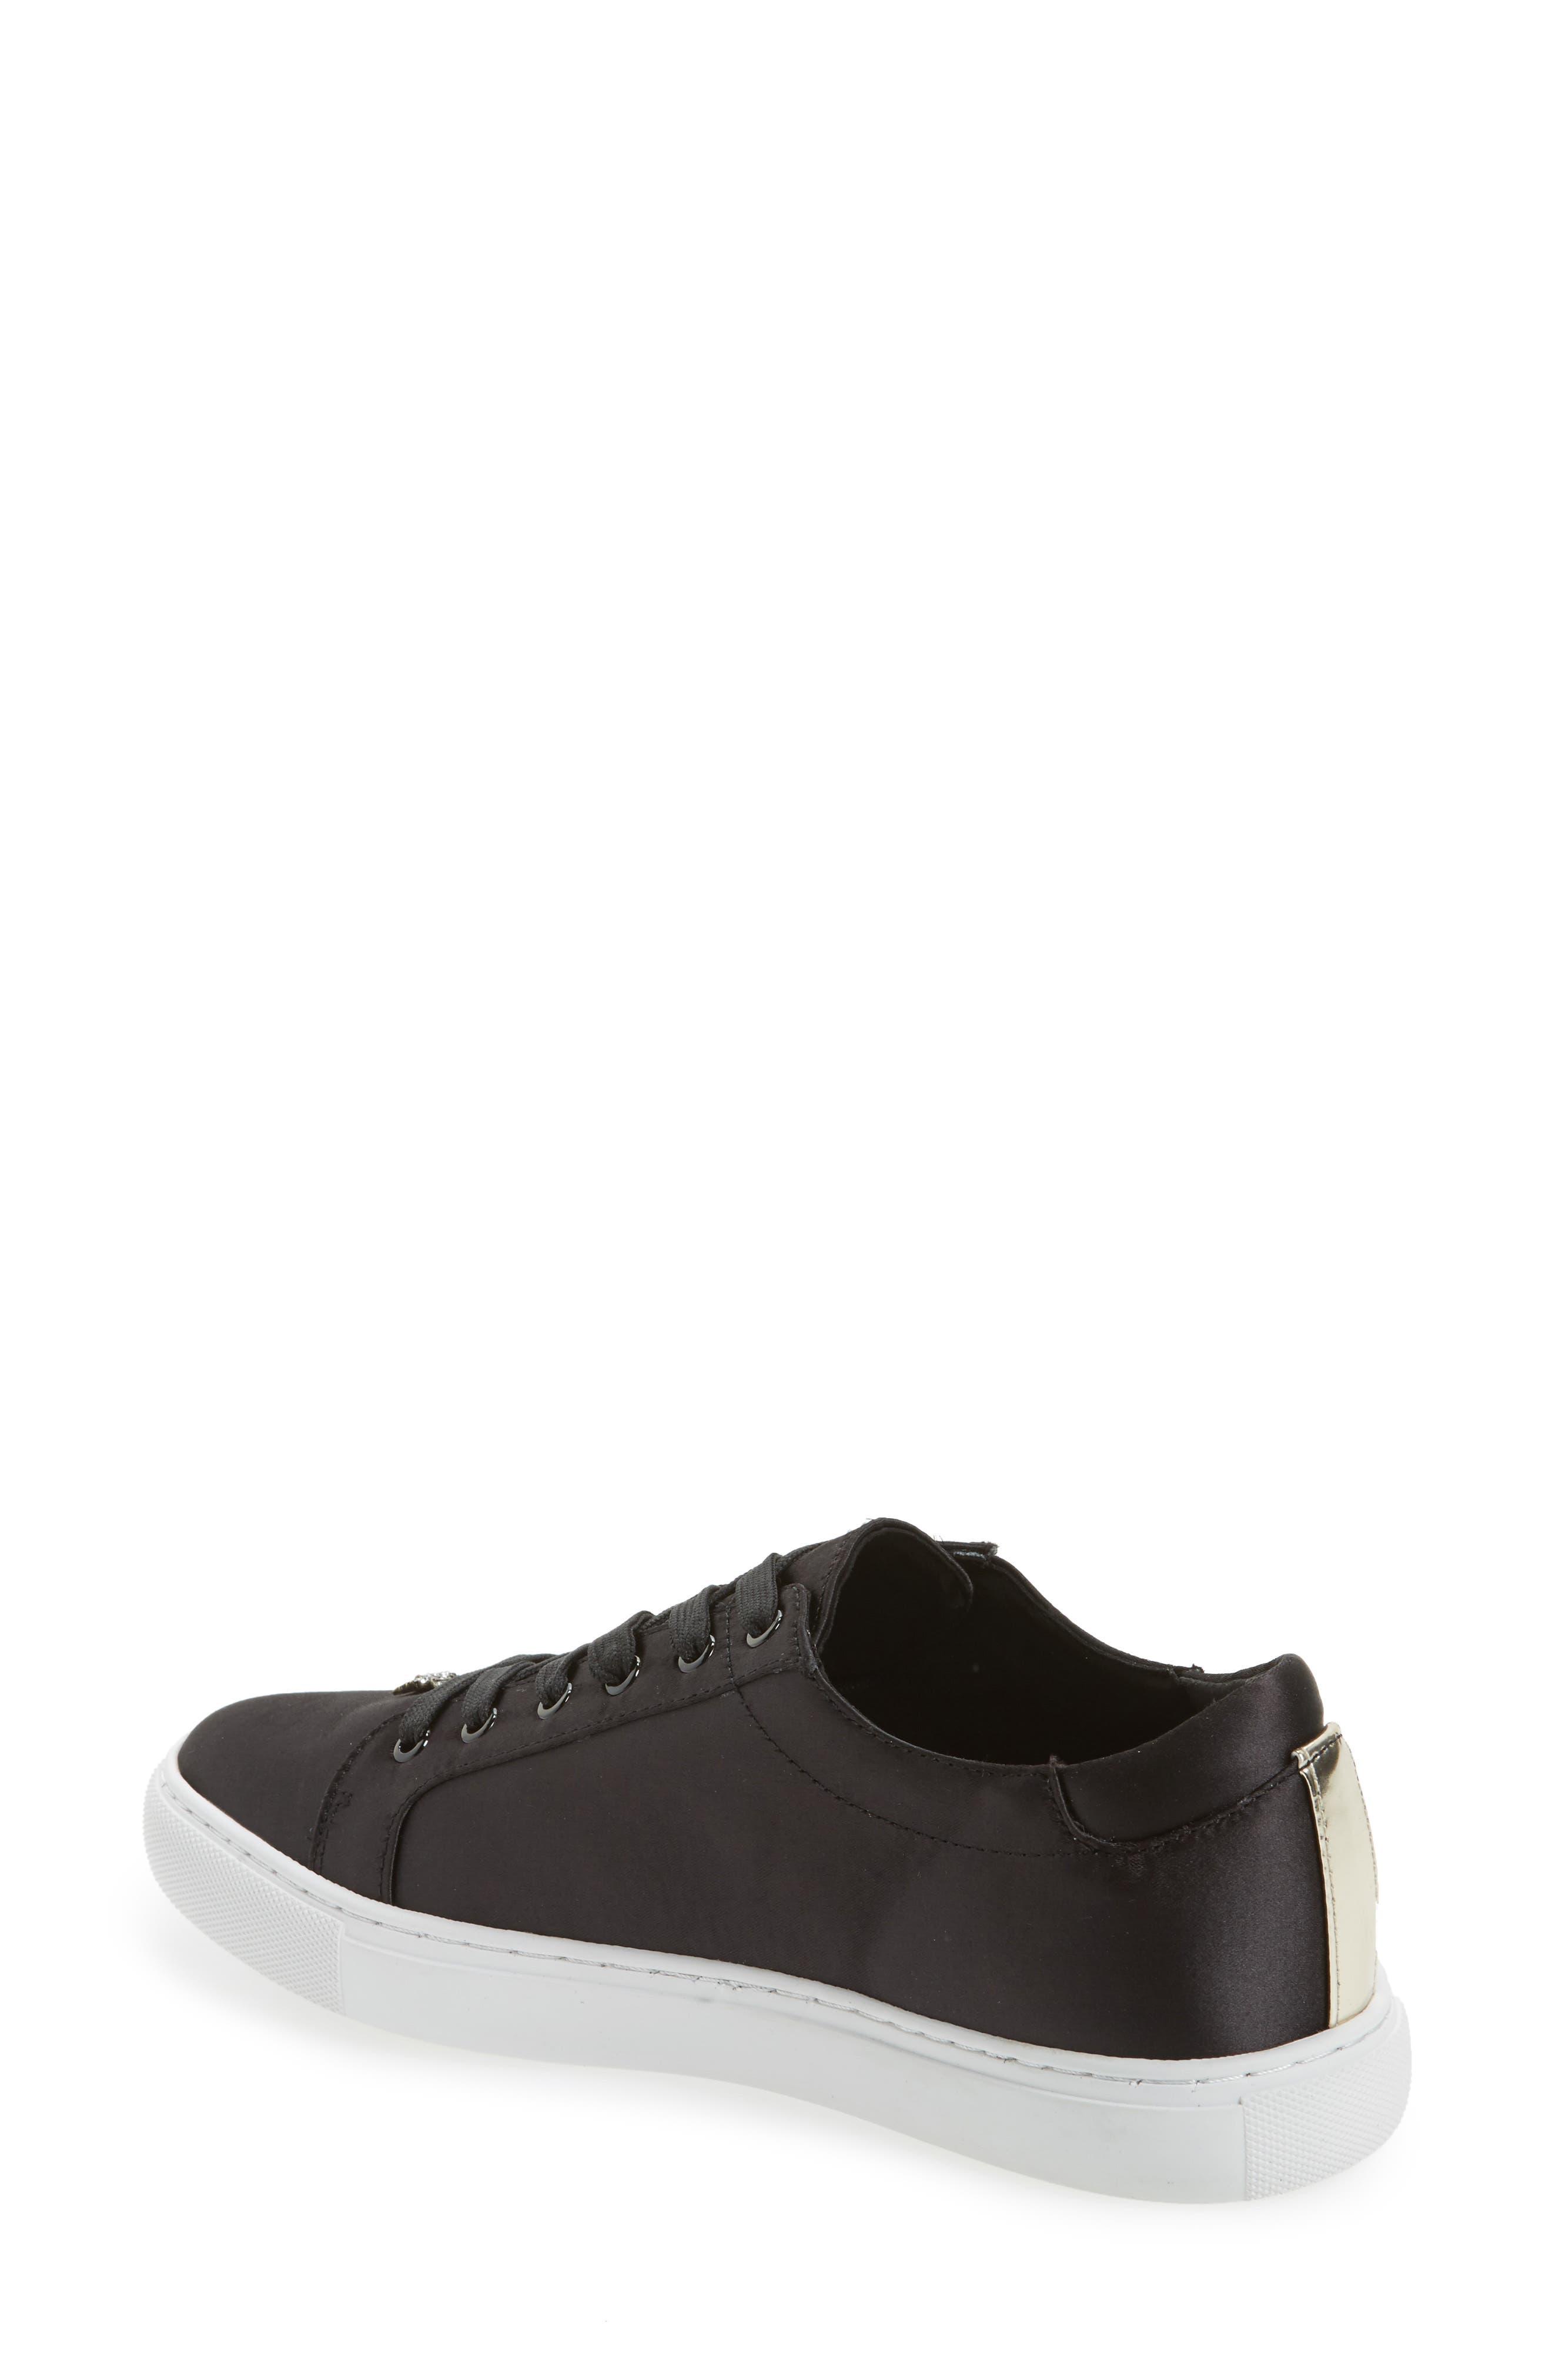 'Kam' Sneaker,                             Alternate thumbnail 2, color,                             Black Satin